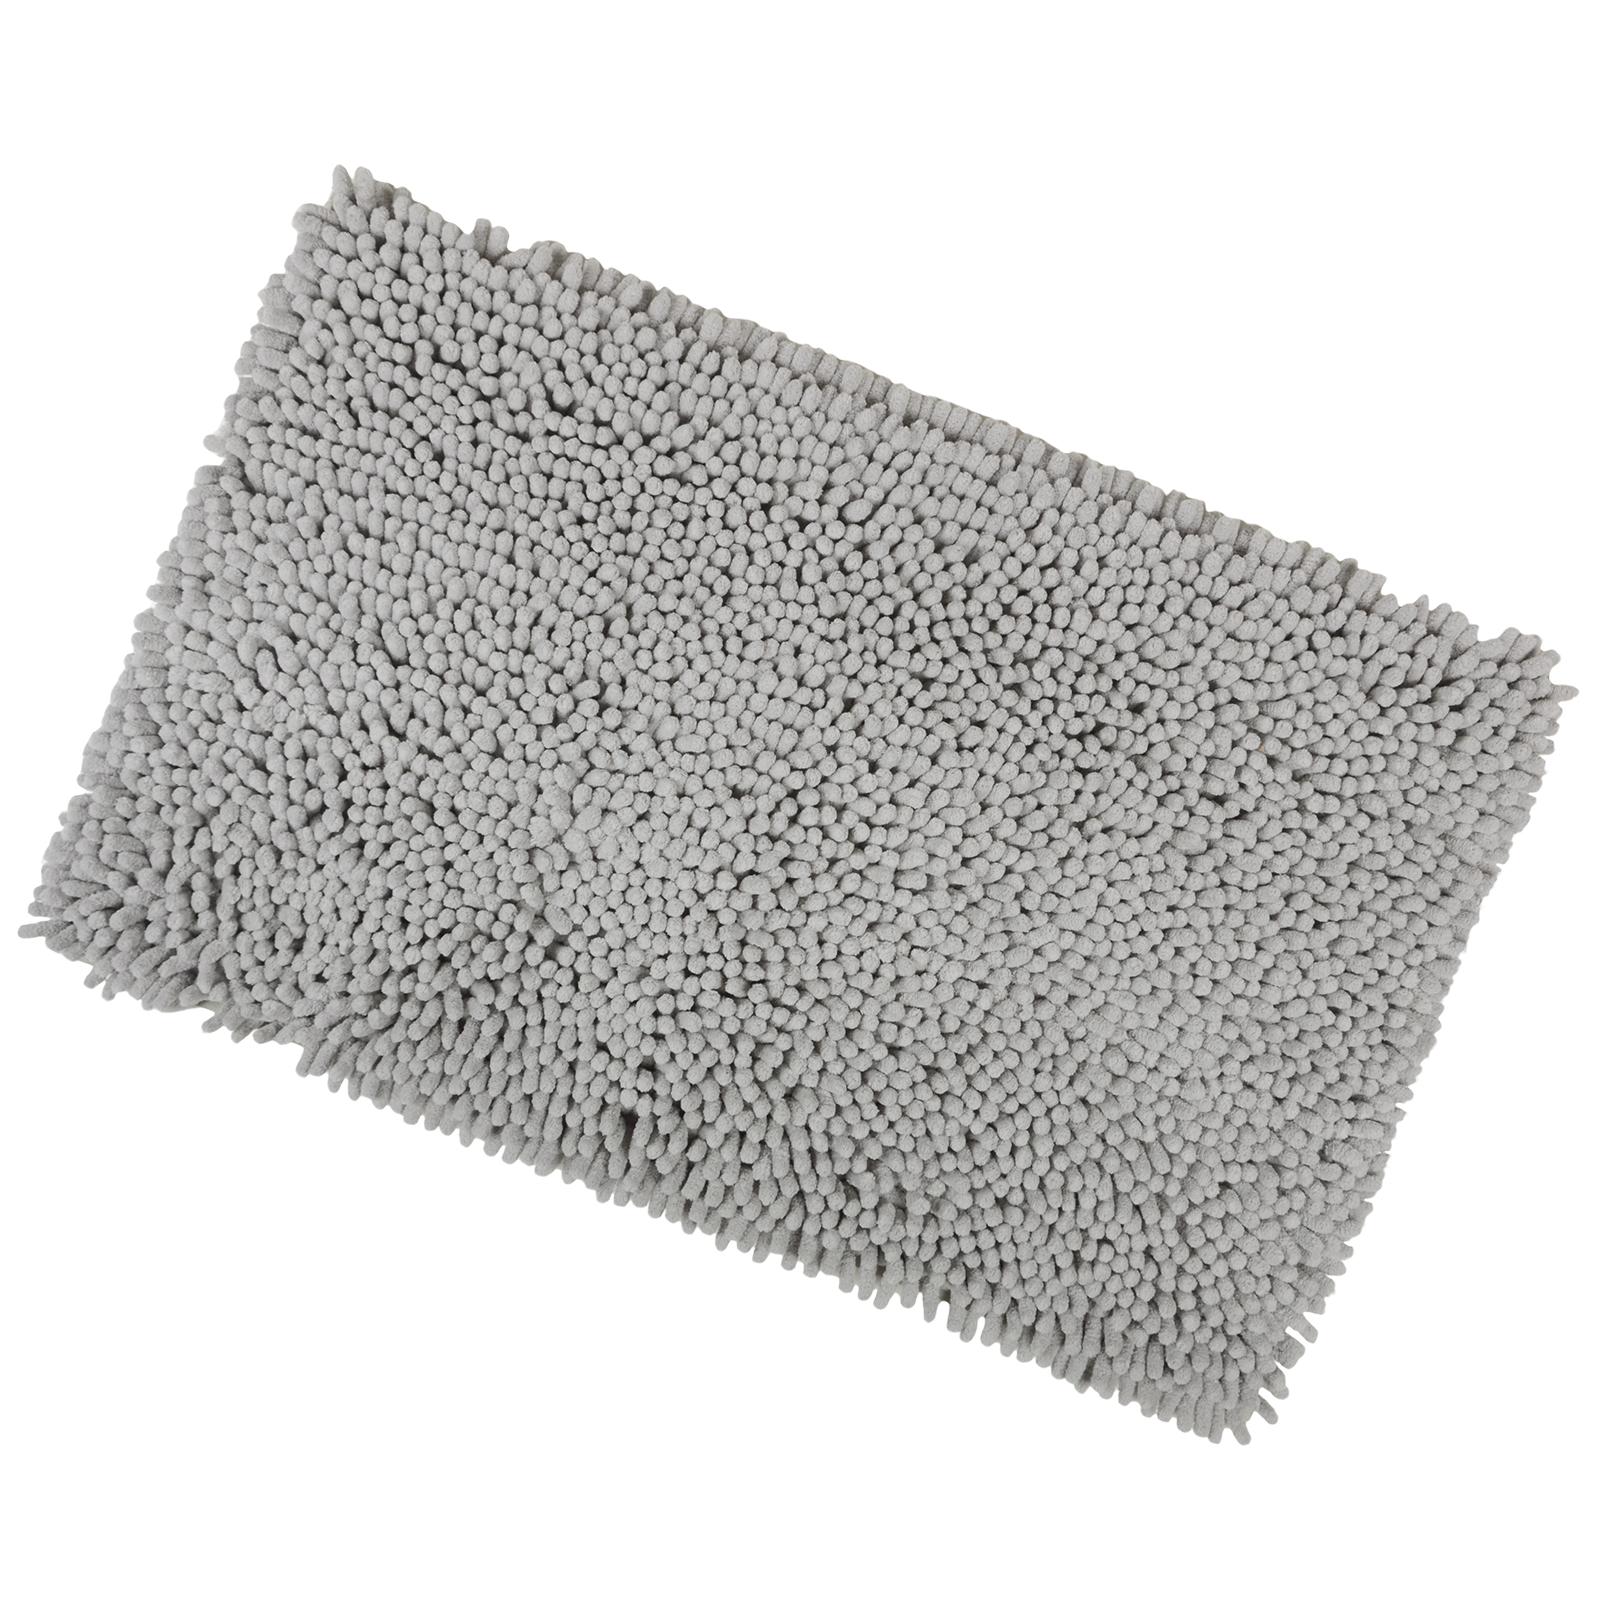 Gy Microfibre Bathroom Shower Bath Mat Rug Non